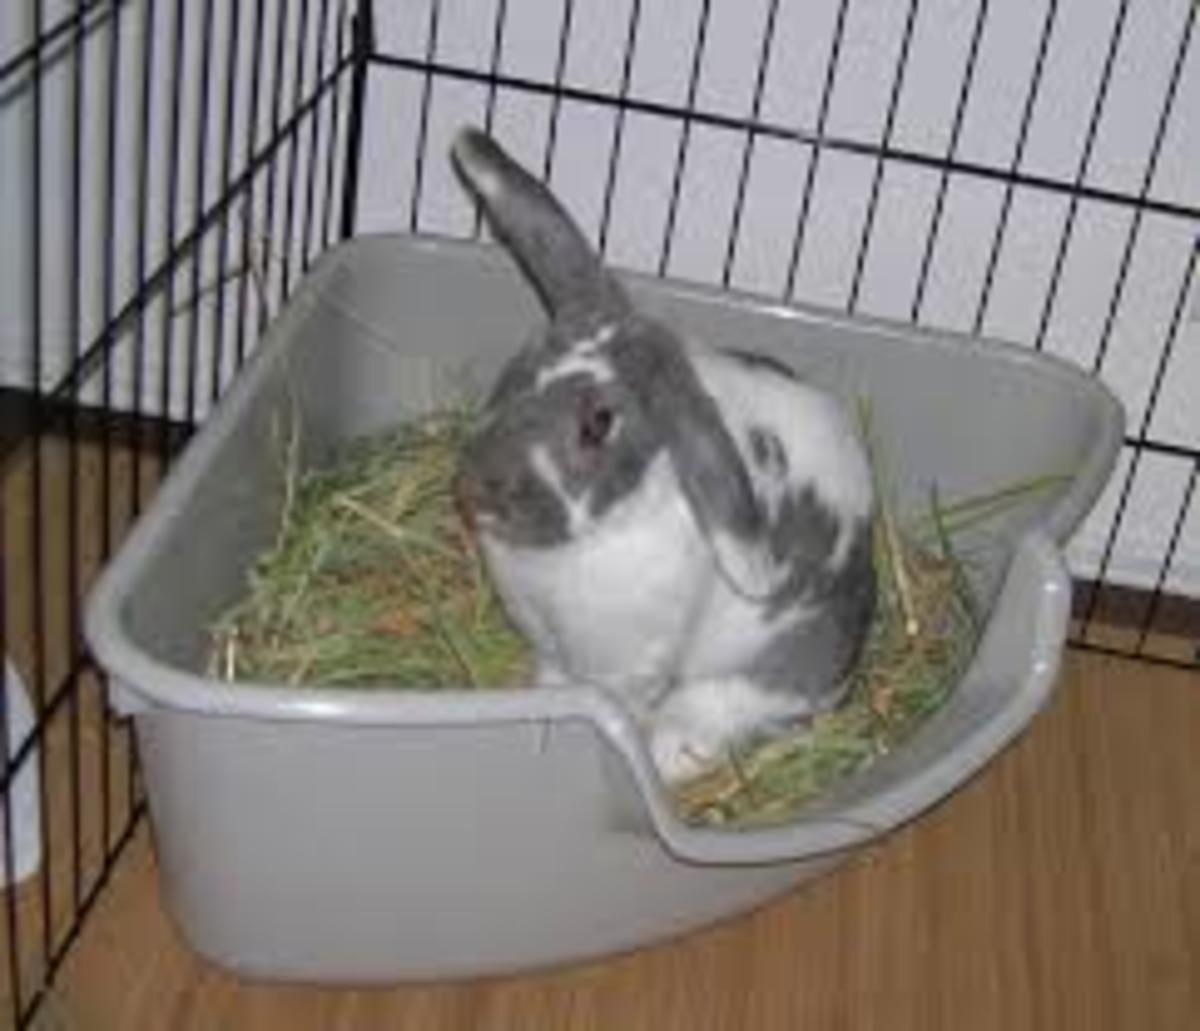 Litter Box Train a Rabbit